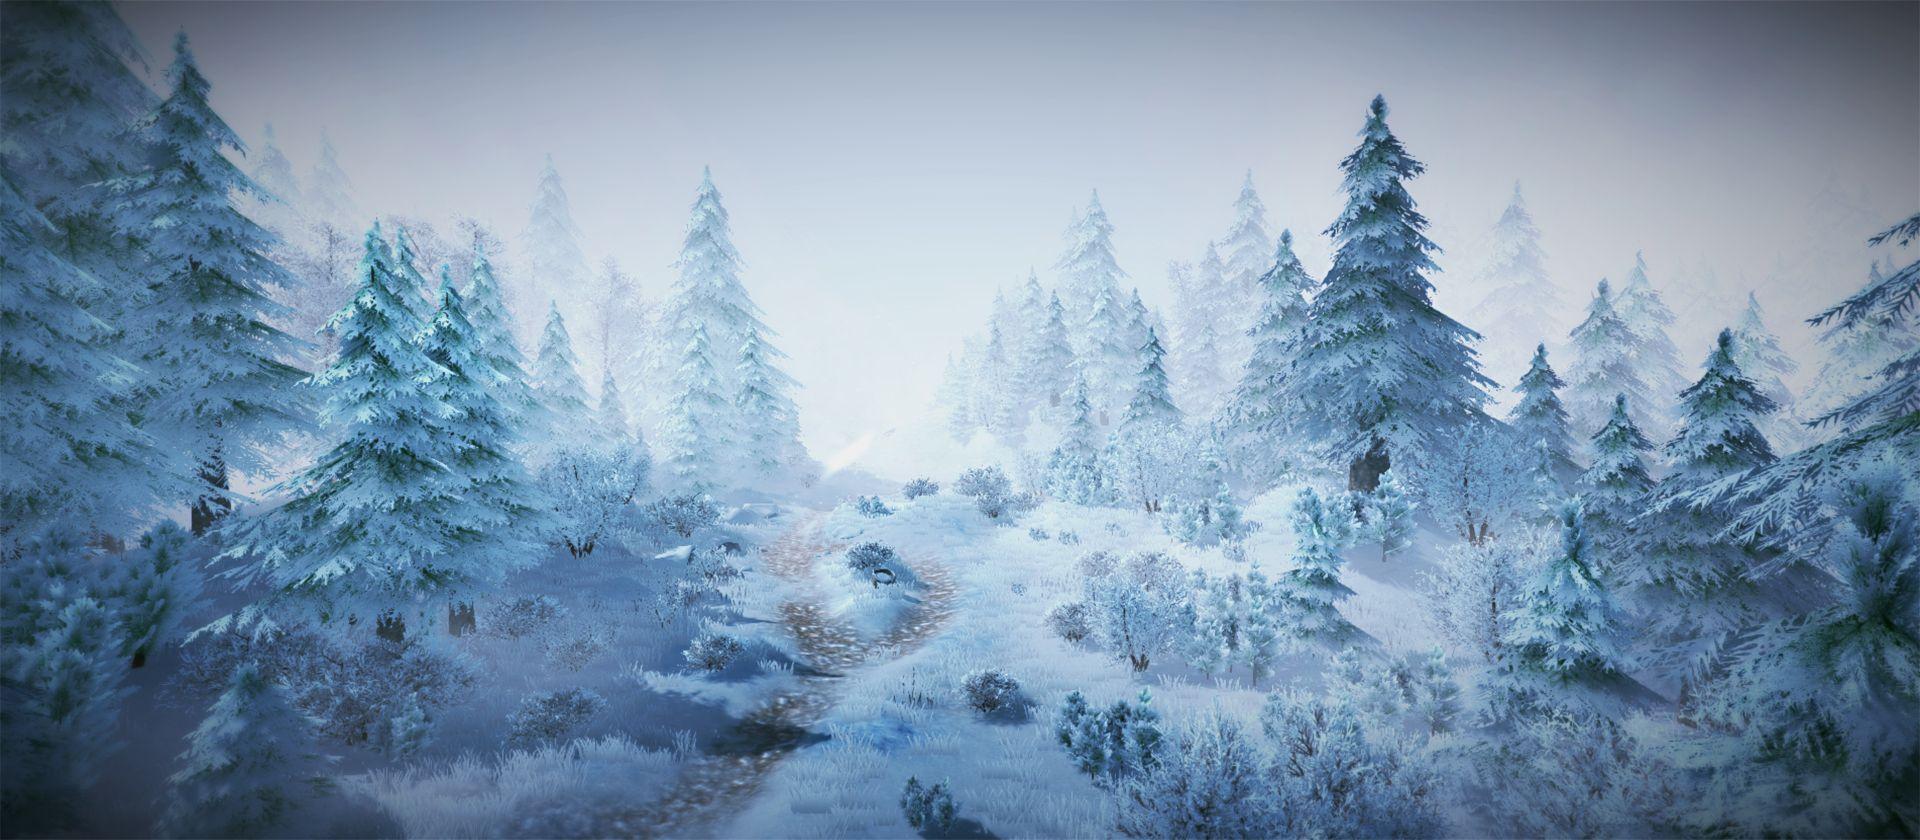 winter_screenshot_01_1920_840.jpg